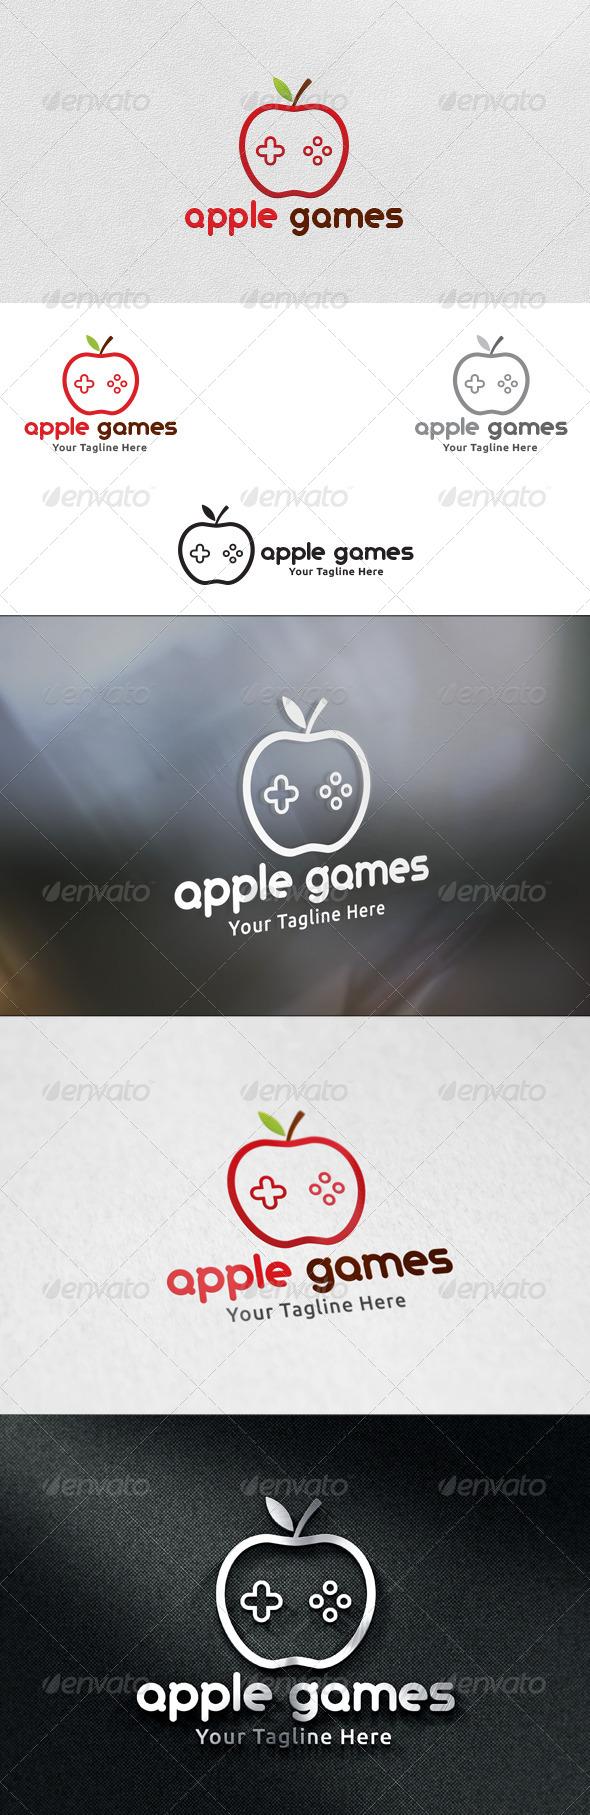 Apple Games - Logo Template